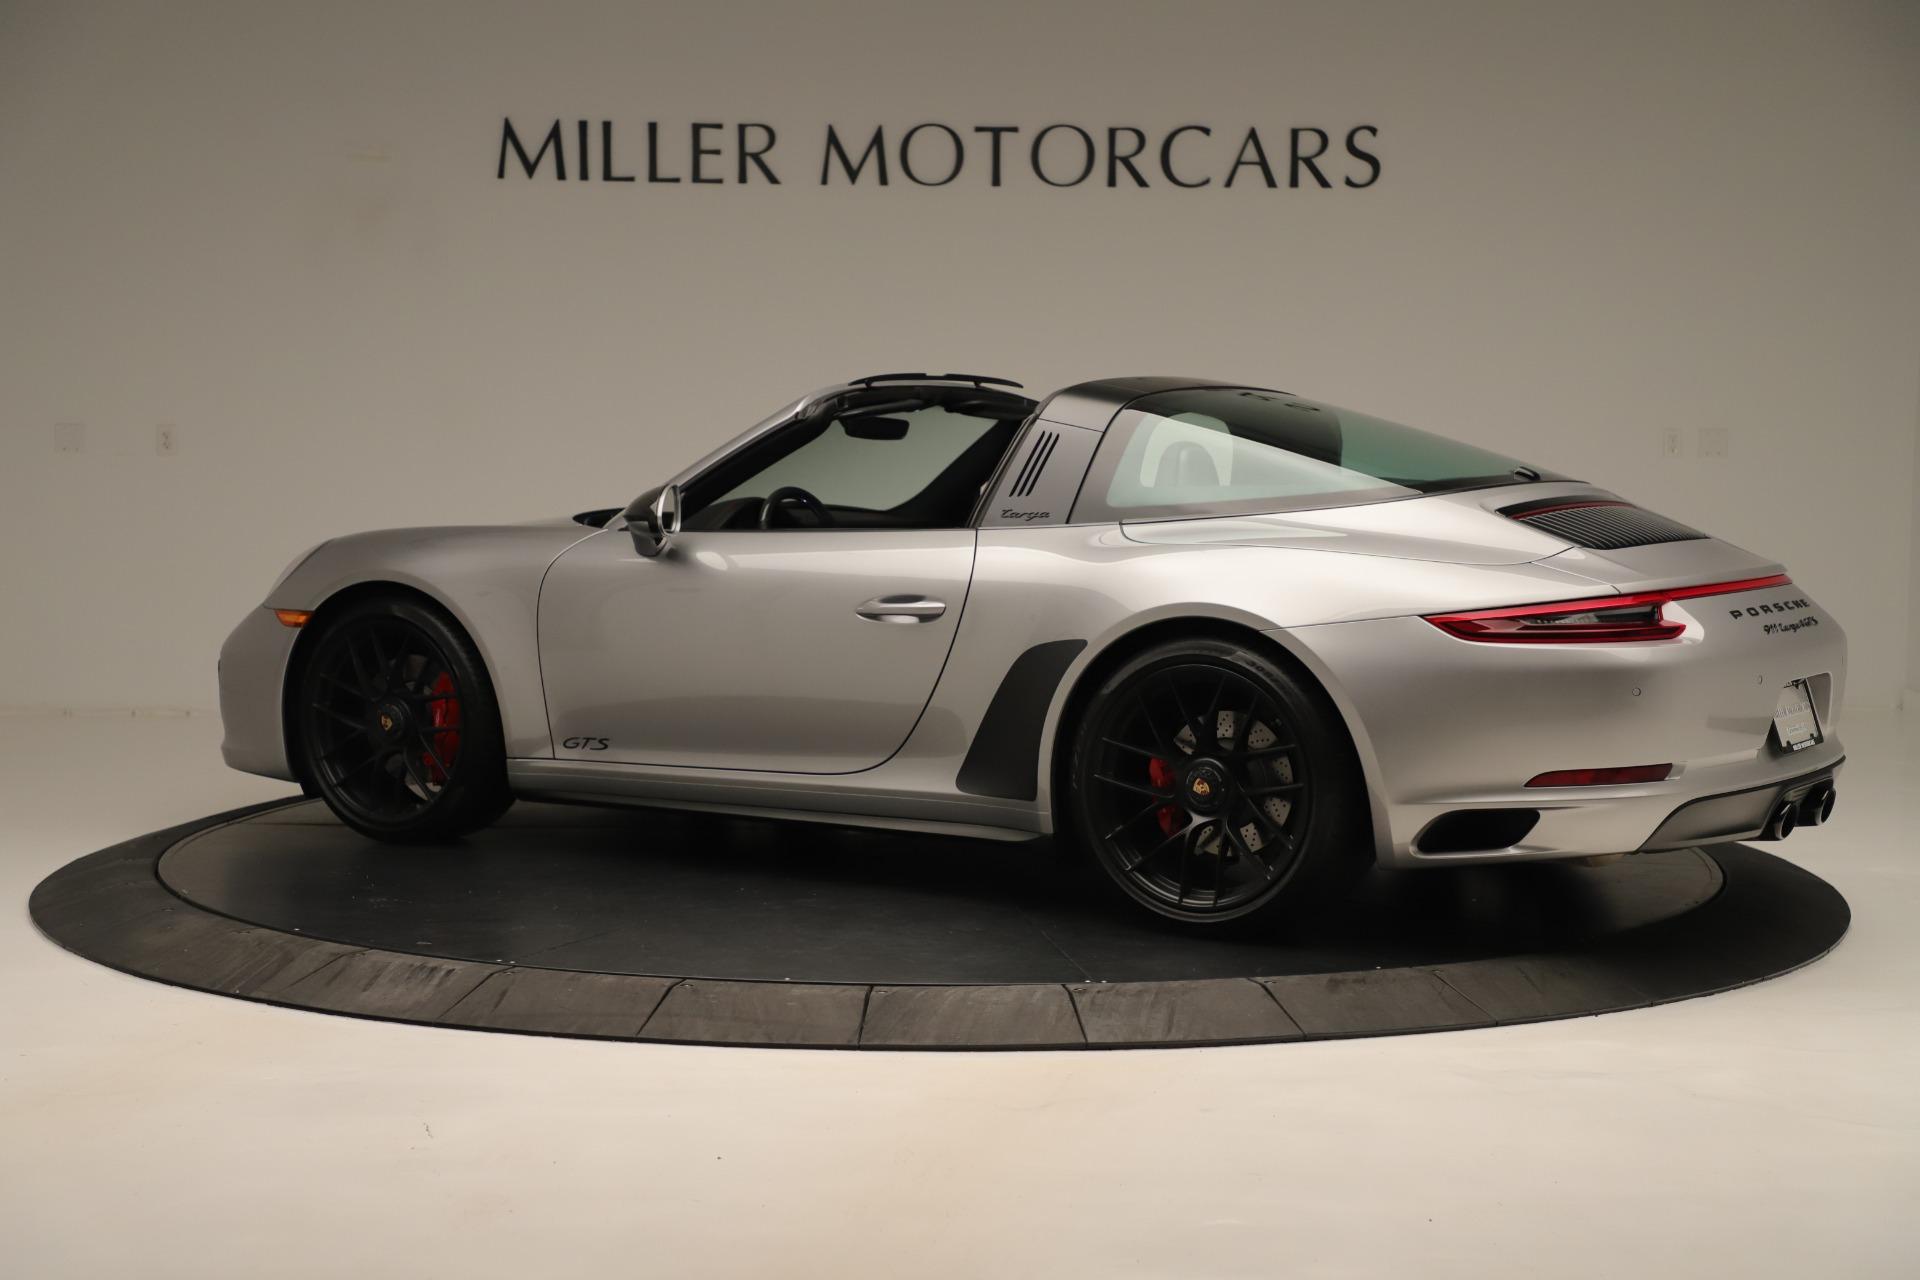 Used 2017 Porsche 911 Targa 4 GTS For Sale In Greenwich, CT 3374_p4